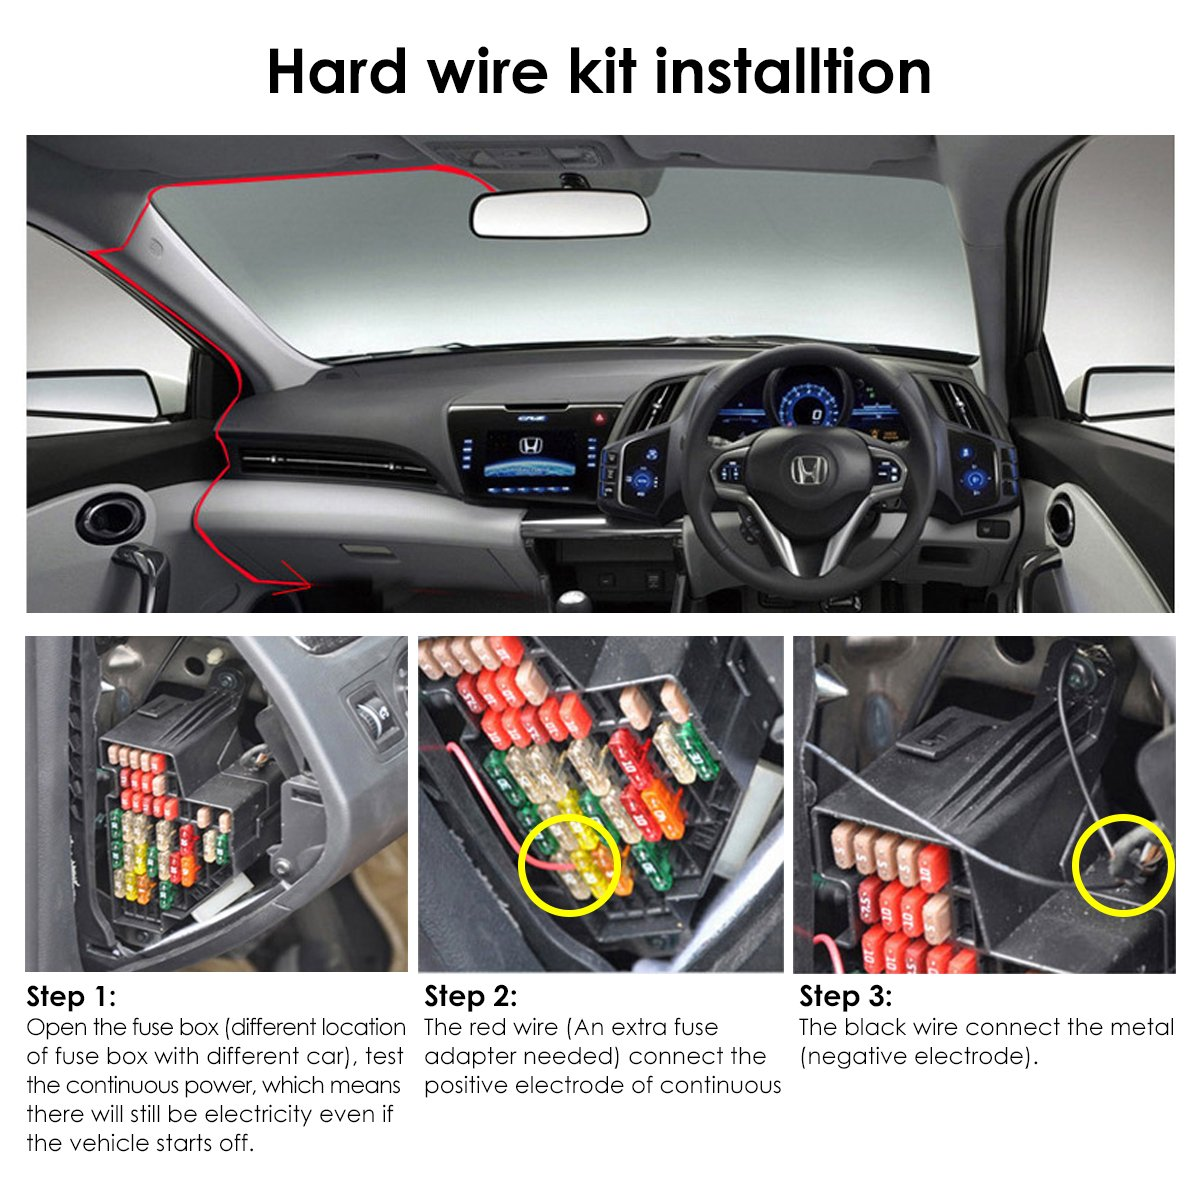 Vantrue Dash Cam Mini Usb Car Hard Wire Kit Micro Port Fuse Box Charger Cable 12v